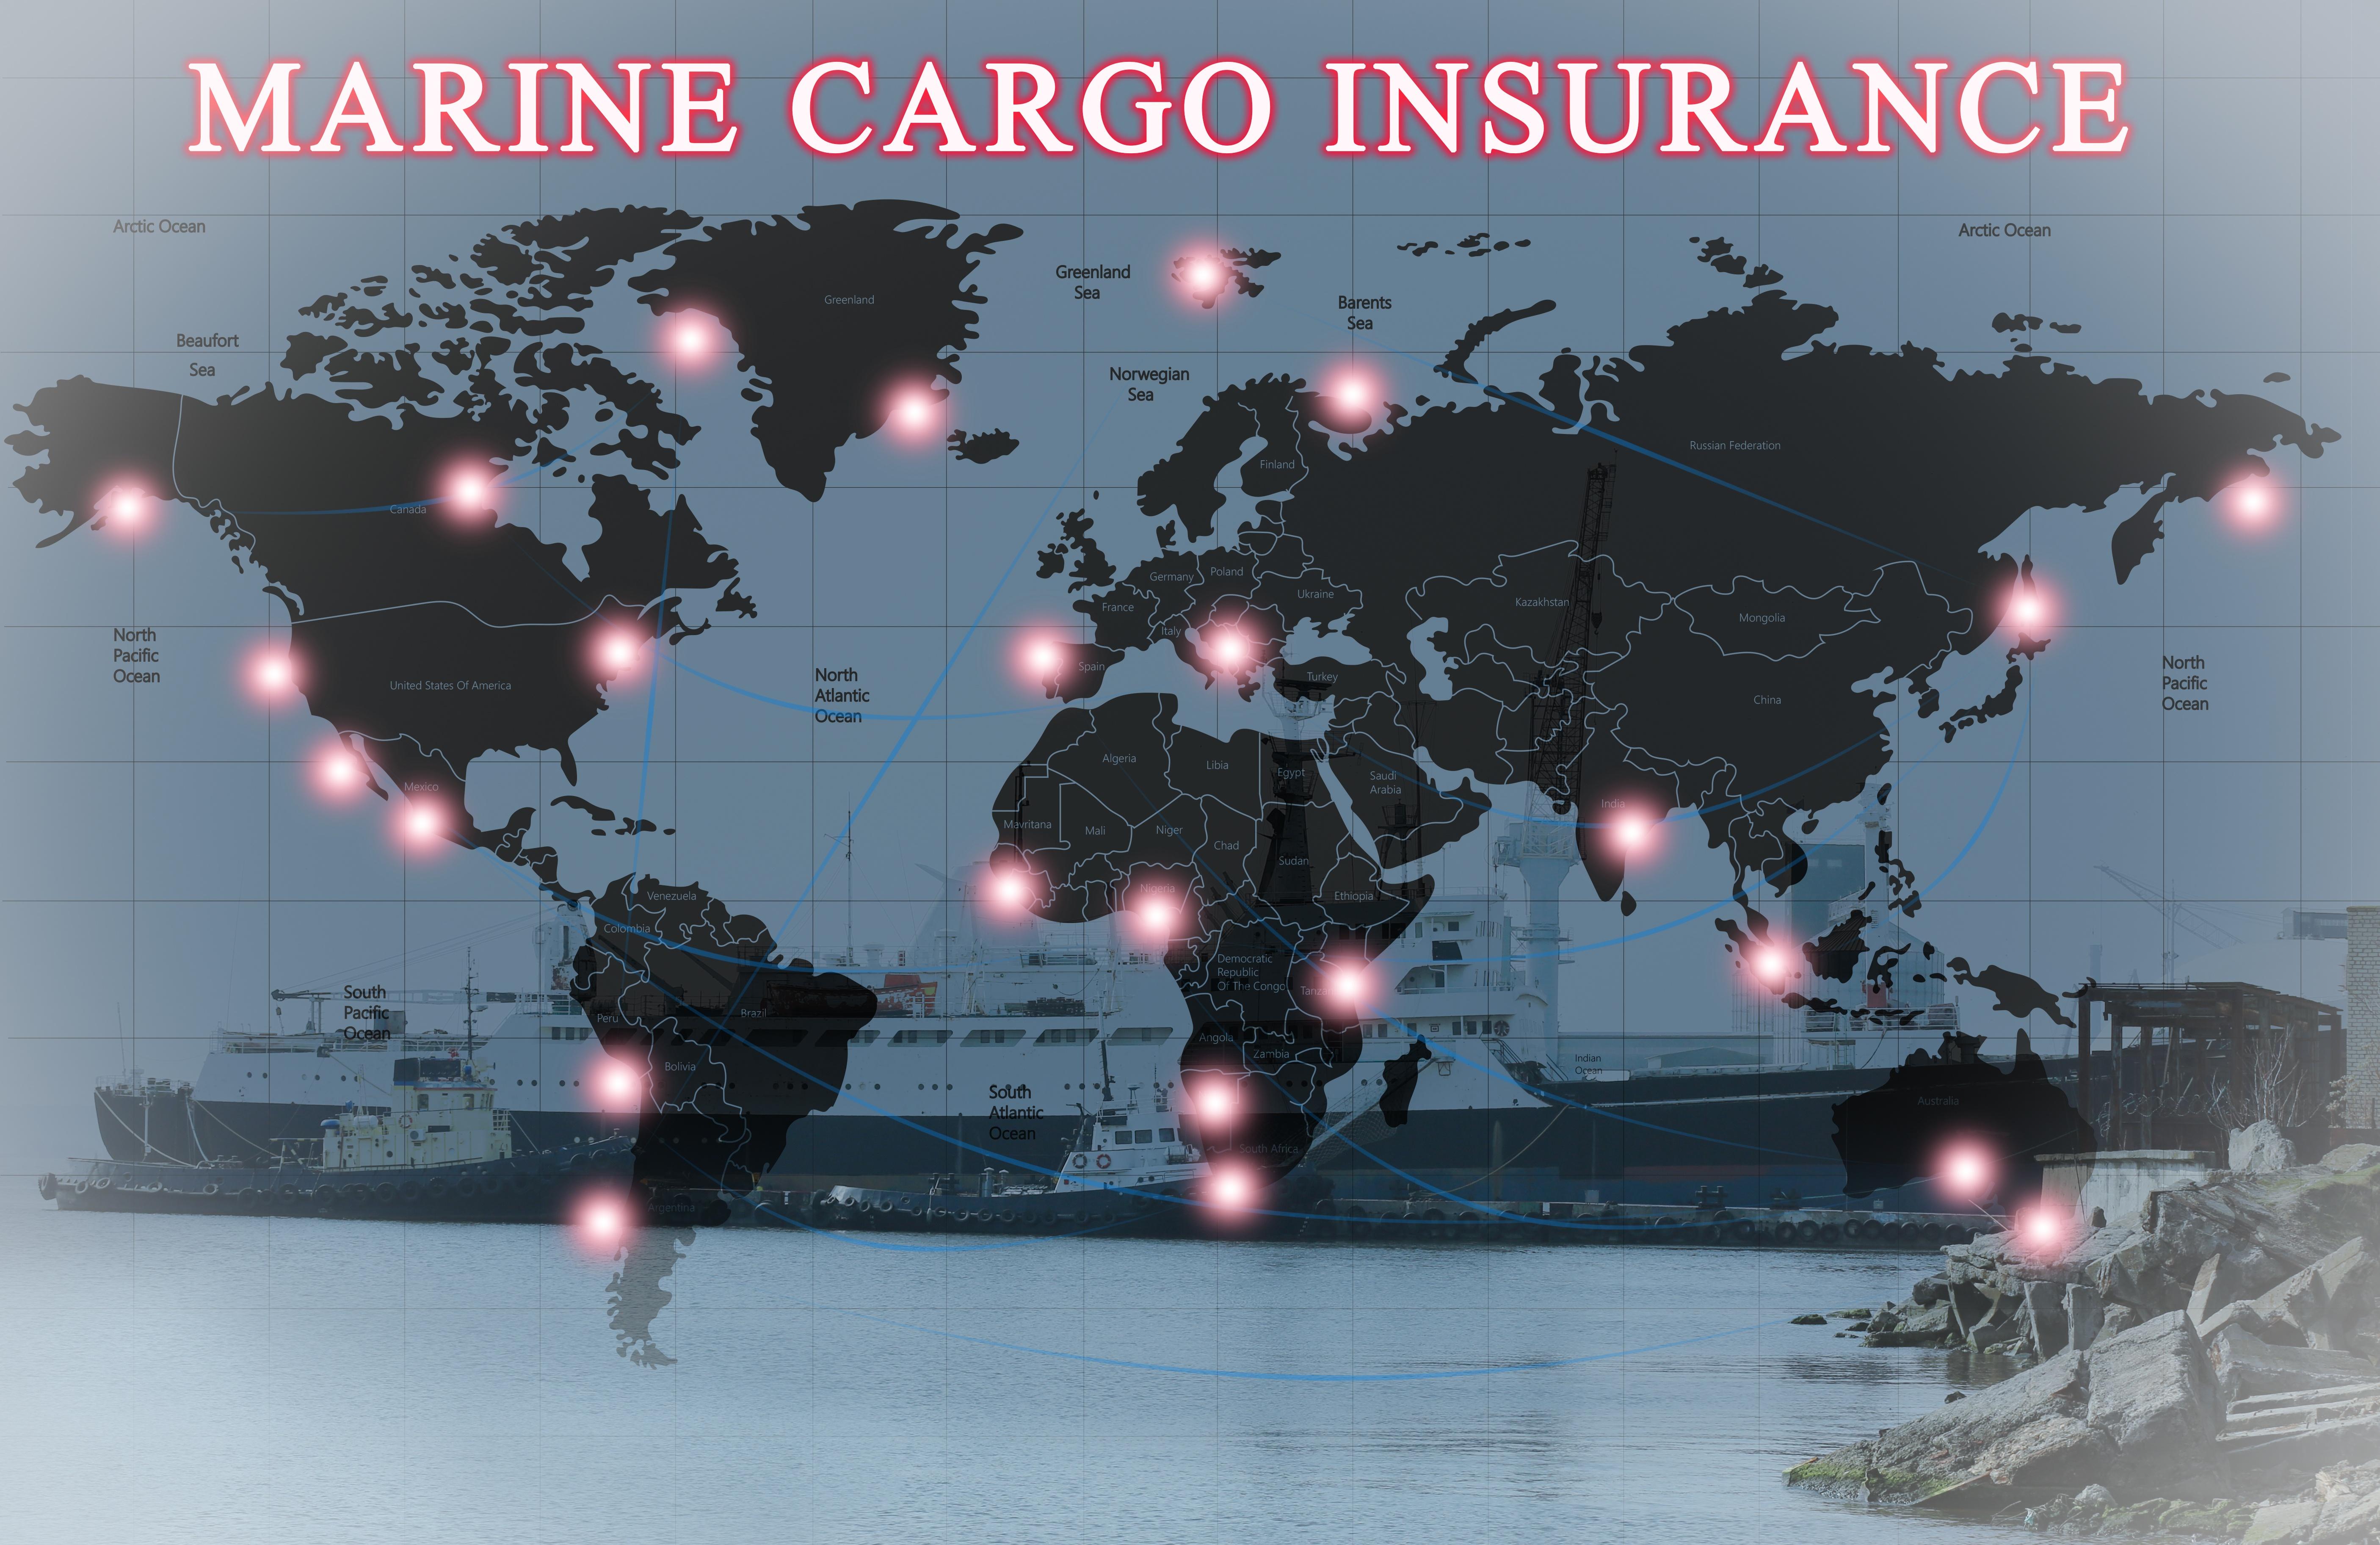 cargo_insurance_general-1.jpg